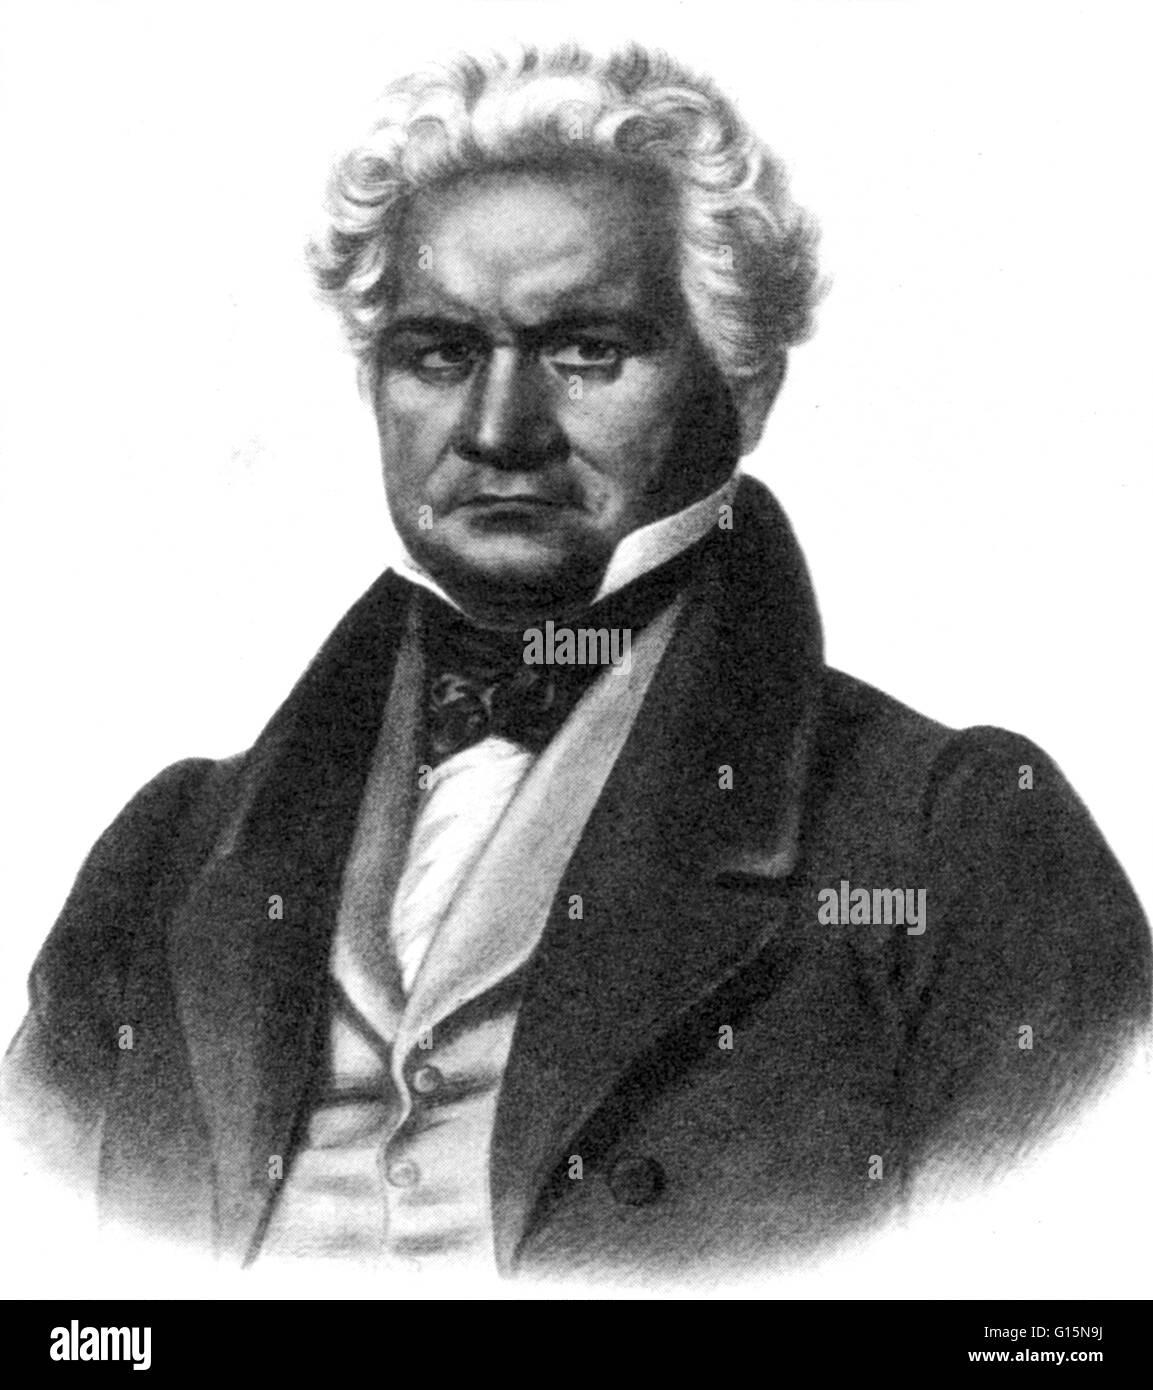 Major Ridge (1771 - June 22, 1839) was a Cherokee leader, a member of the tribal council, a Chickamauga warrior, - Stock Image